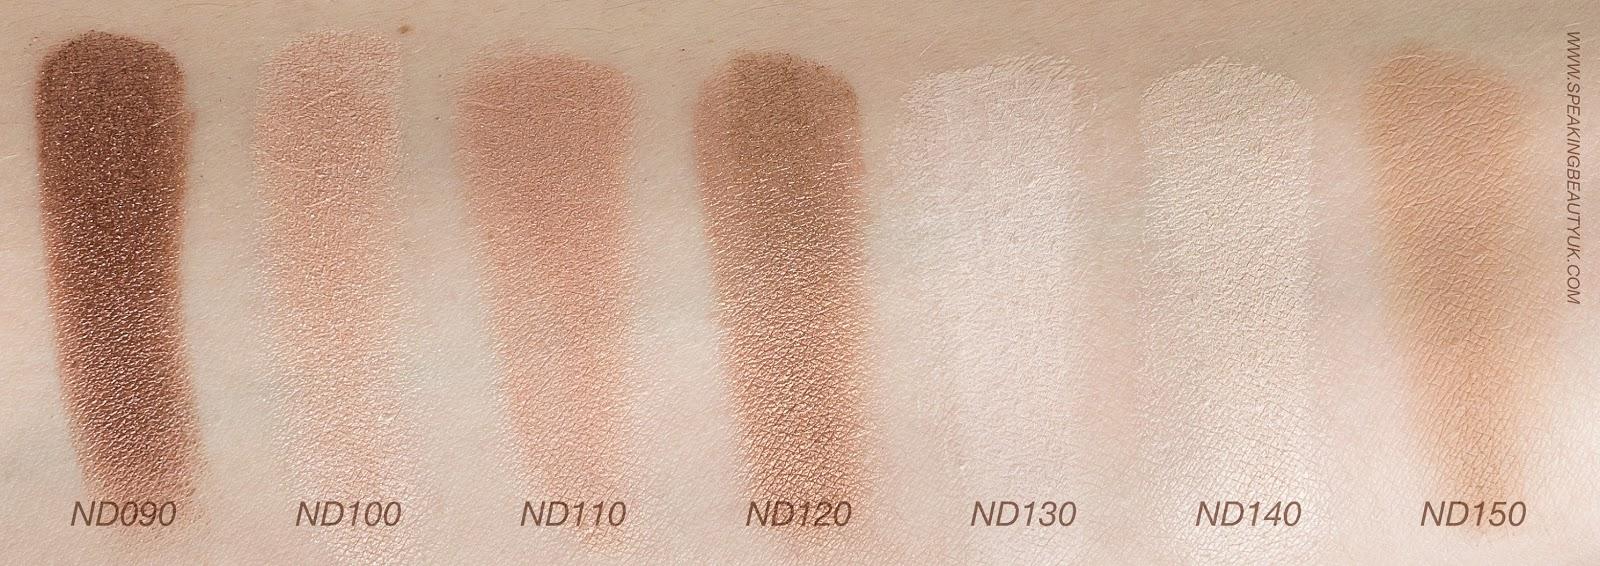 Zoeva Nude Spectrum Eyeshadow Palette swatches